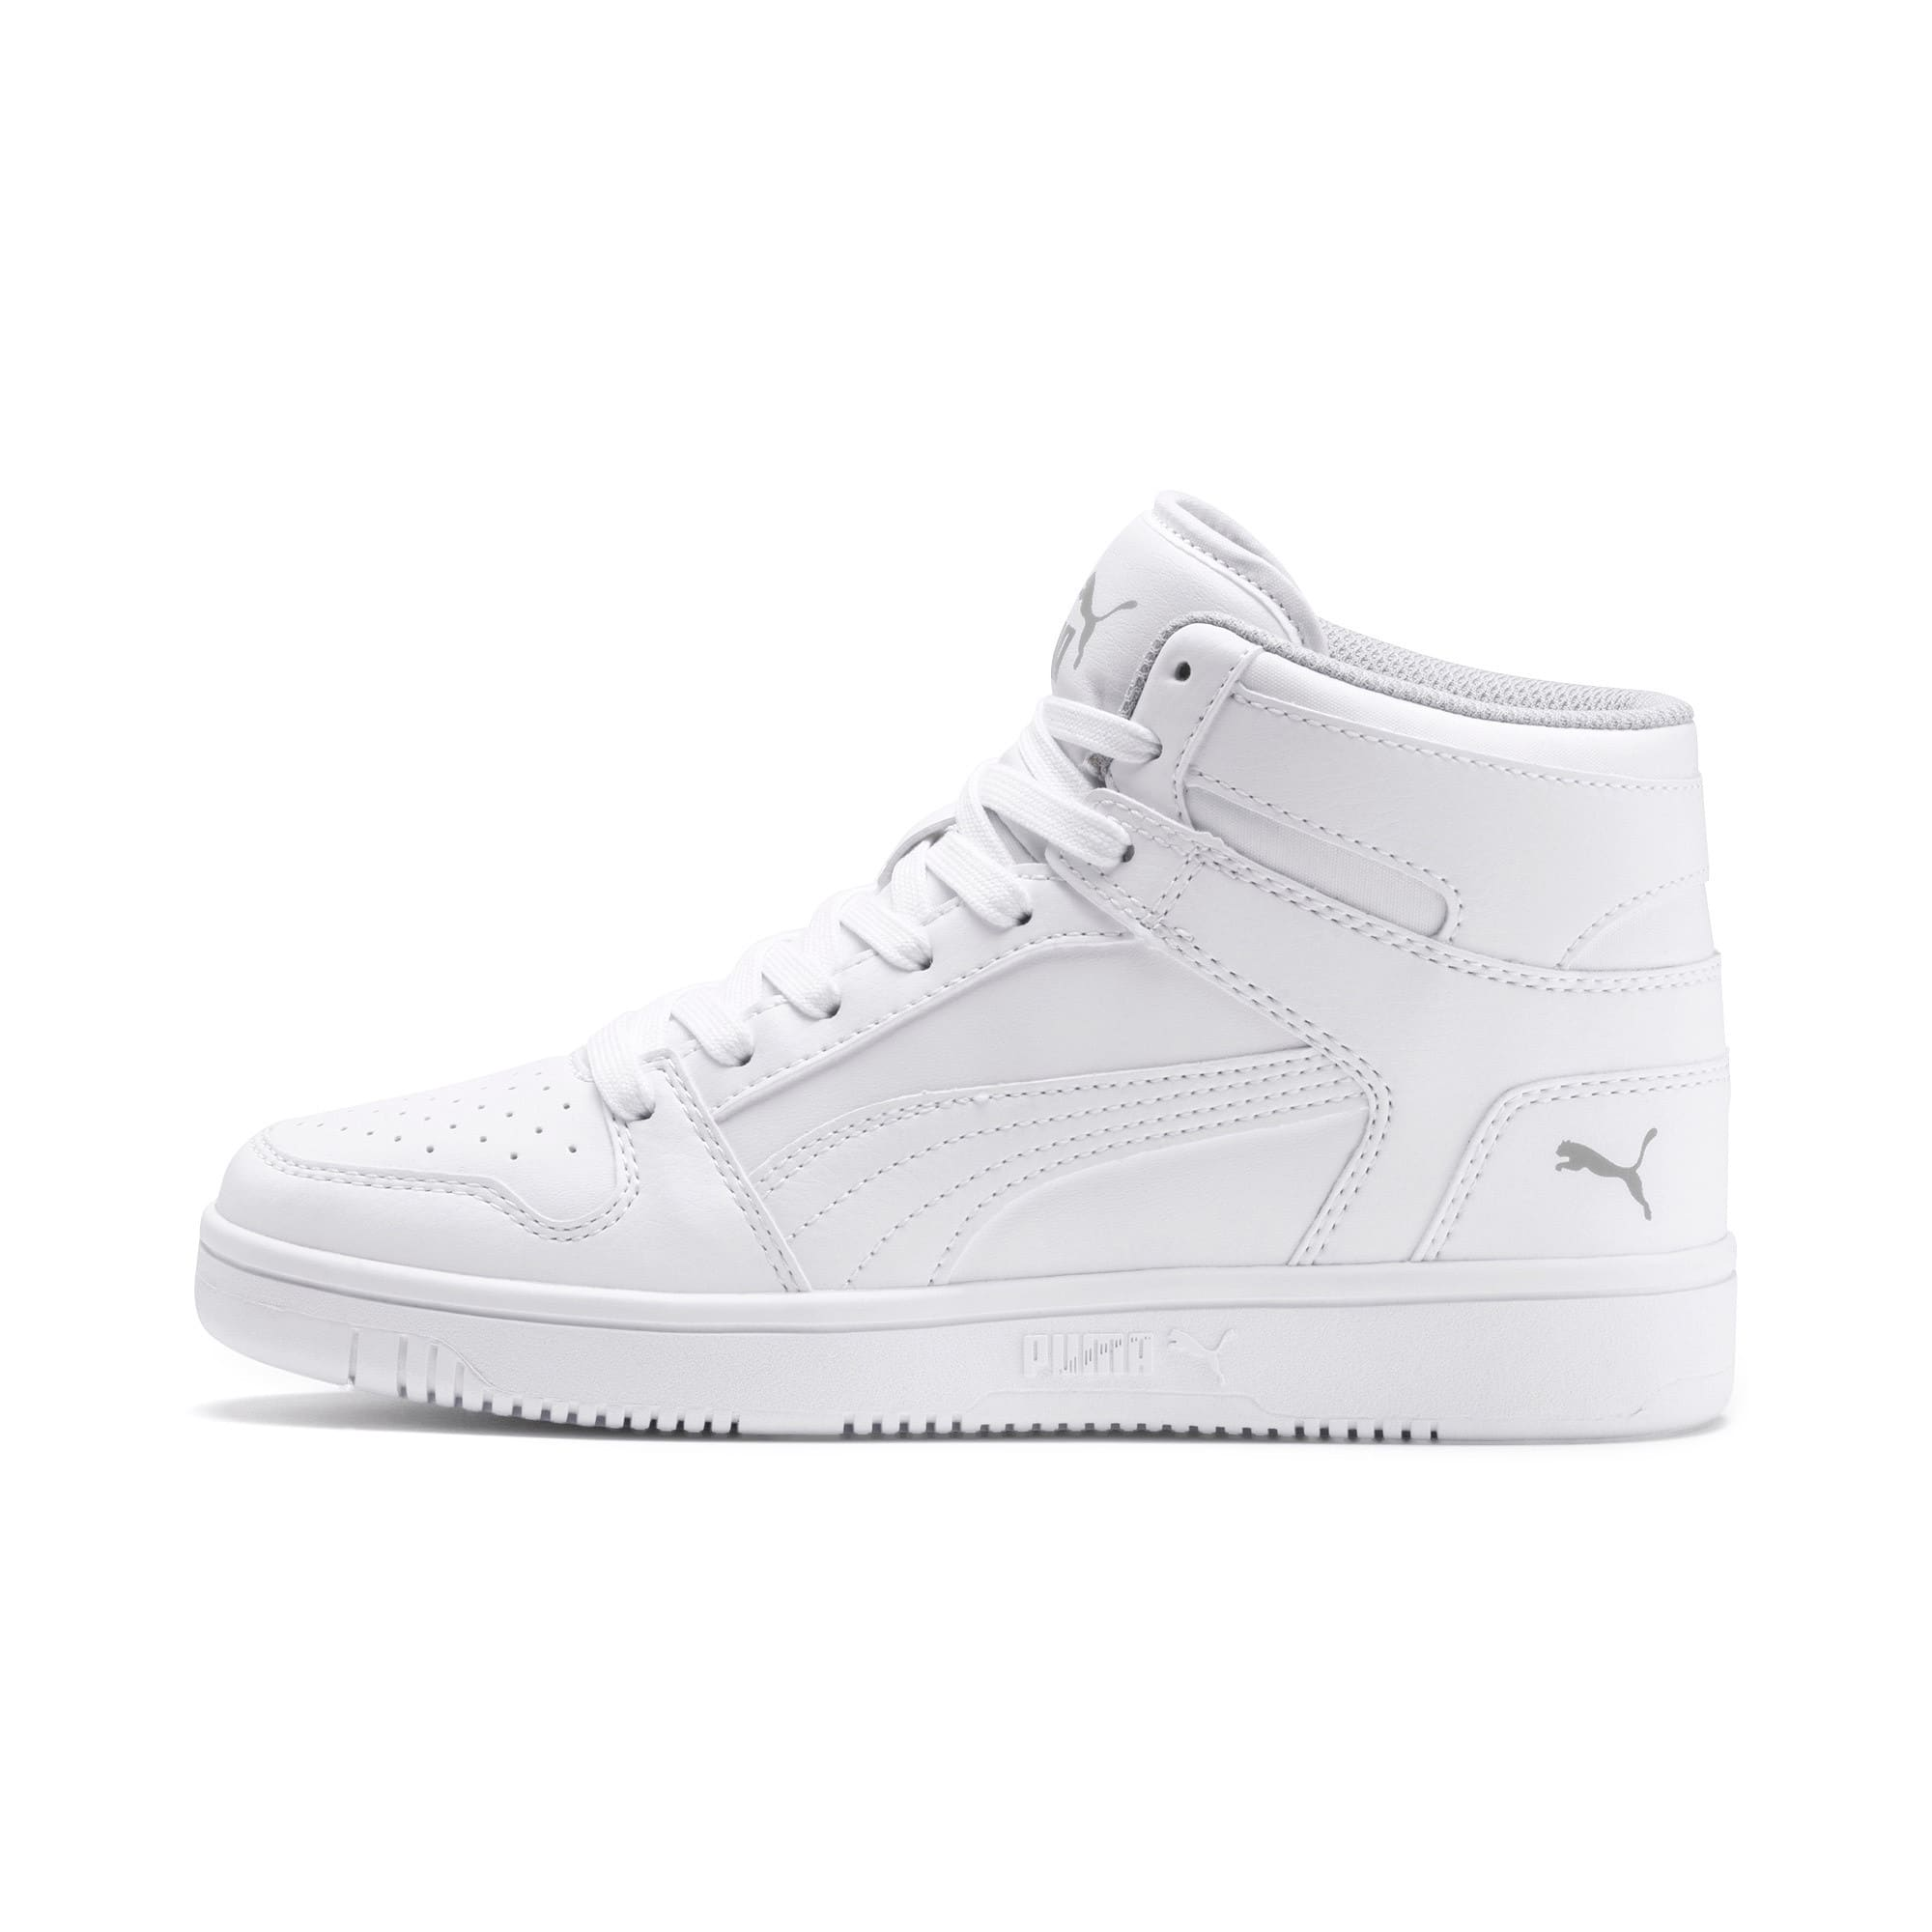 Thumbnail 1 of PUMA Rebound LayUp Mid Sneakers JR, Puma White-Gray Violet, medium